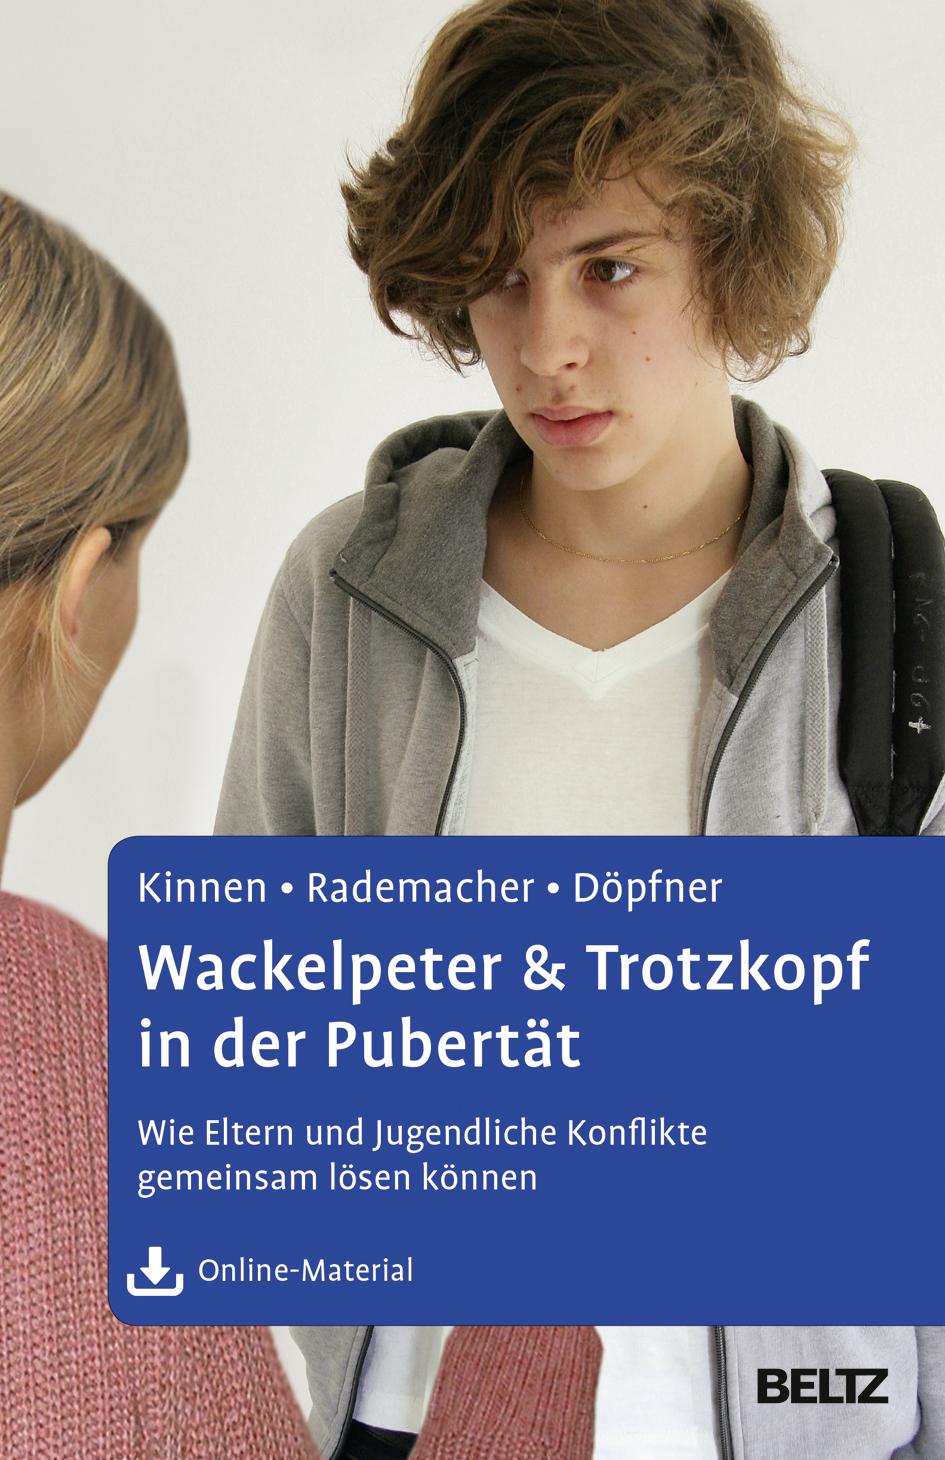 Wackelpeter & Trotzkopf in der Pubertät Claudia Kinnen